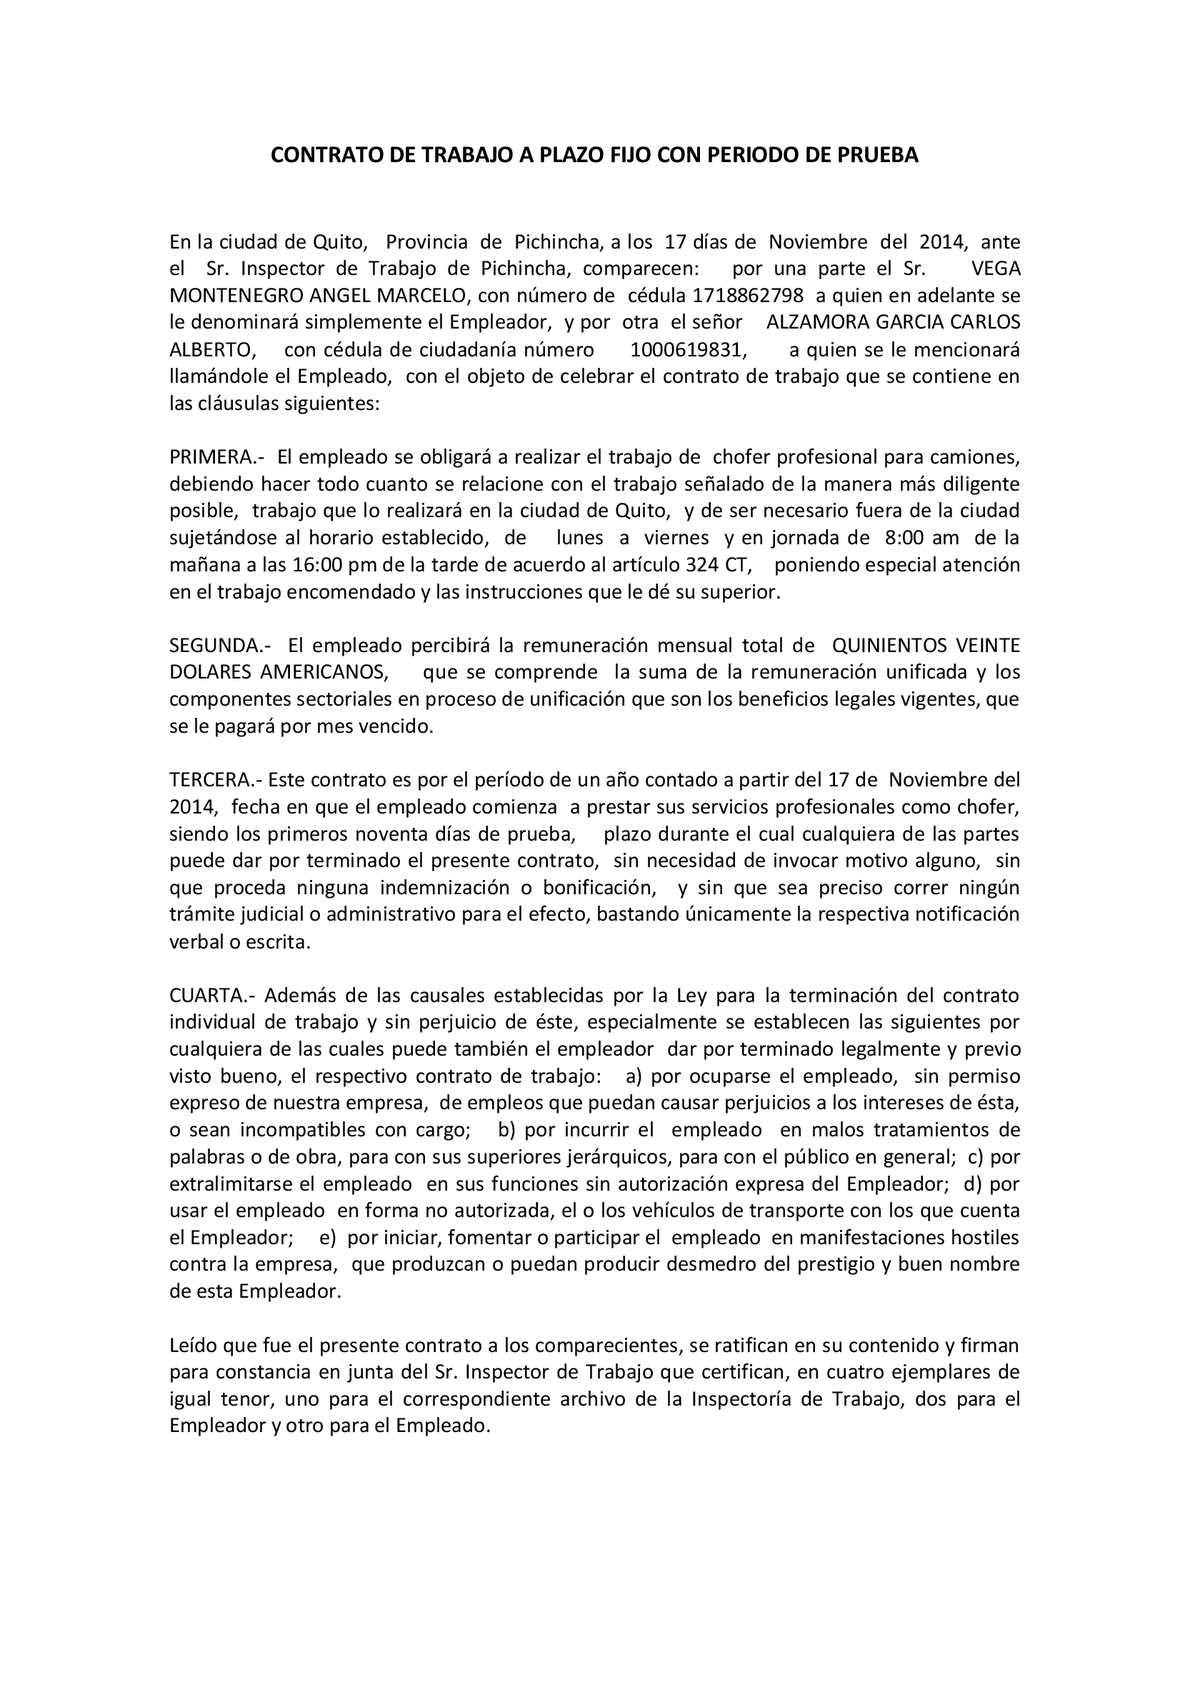 Calam O Contrato De Trabajo A Plazo Fijo Con Periodo De: contrato trabajo